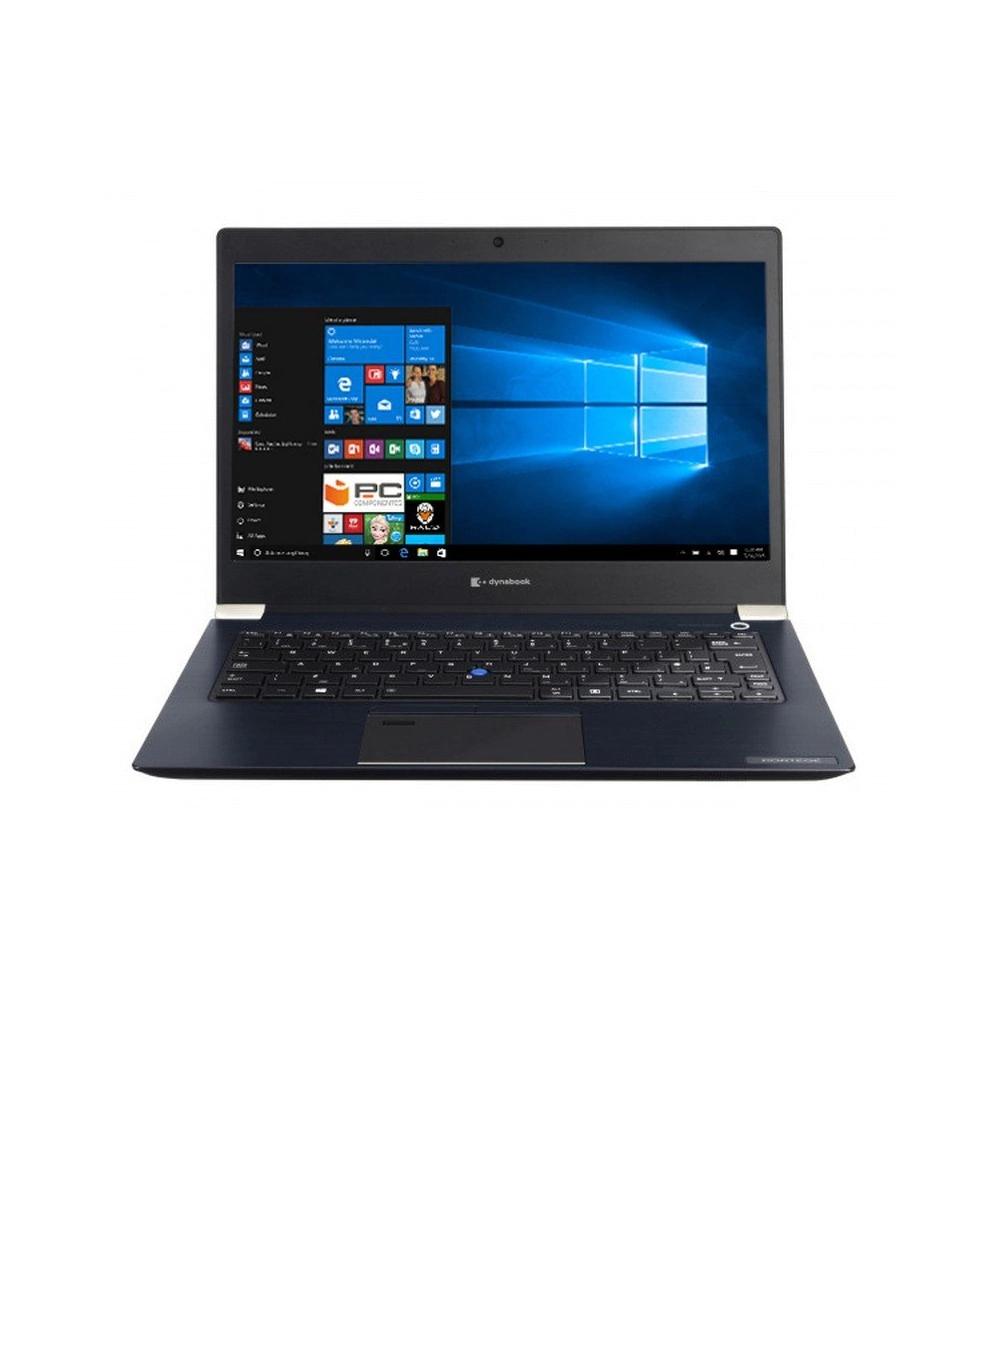 Portátil Toshiba Dynabook Portégé X30-F-14X, i7-8565U, 16GB, 1TB SSD + 32 Optane, 13.3in2, Windows 10 Pro, Azul Ónice